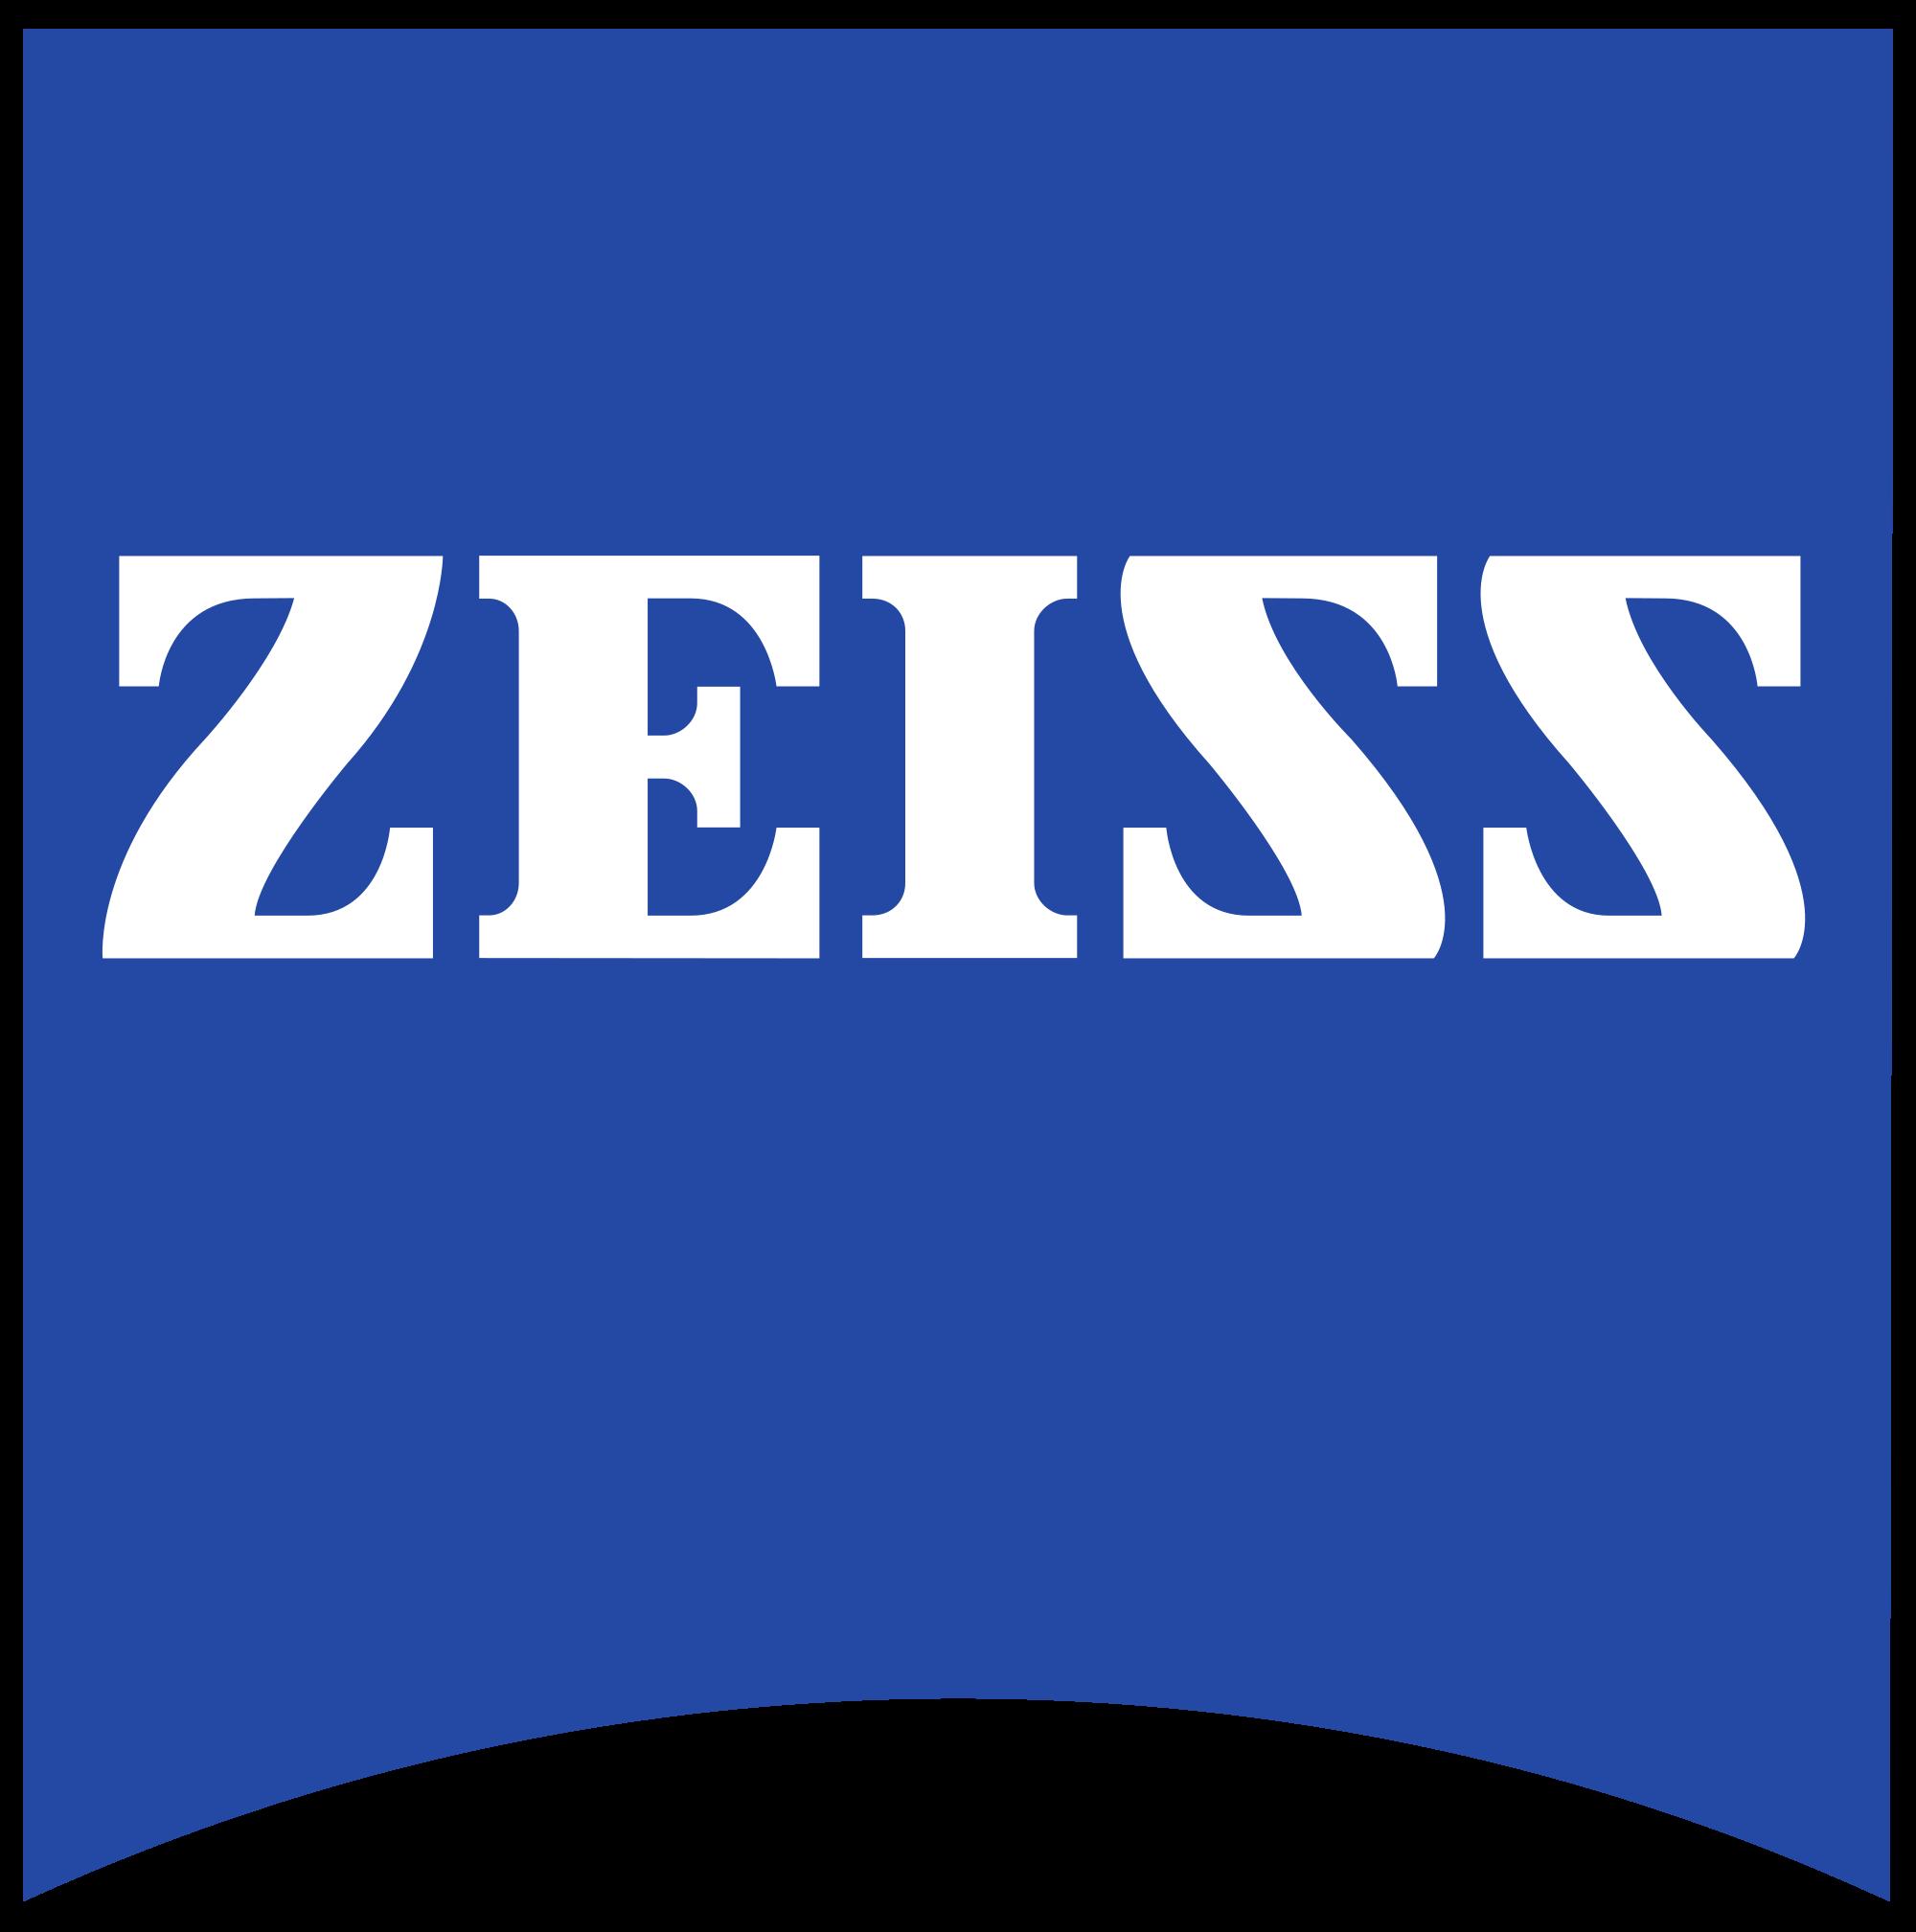 Carl Zeiss logo